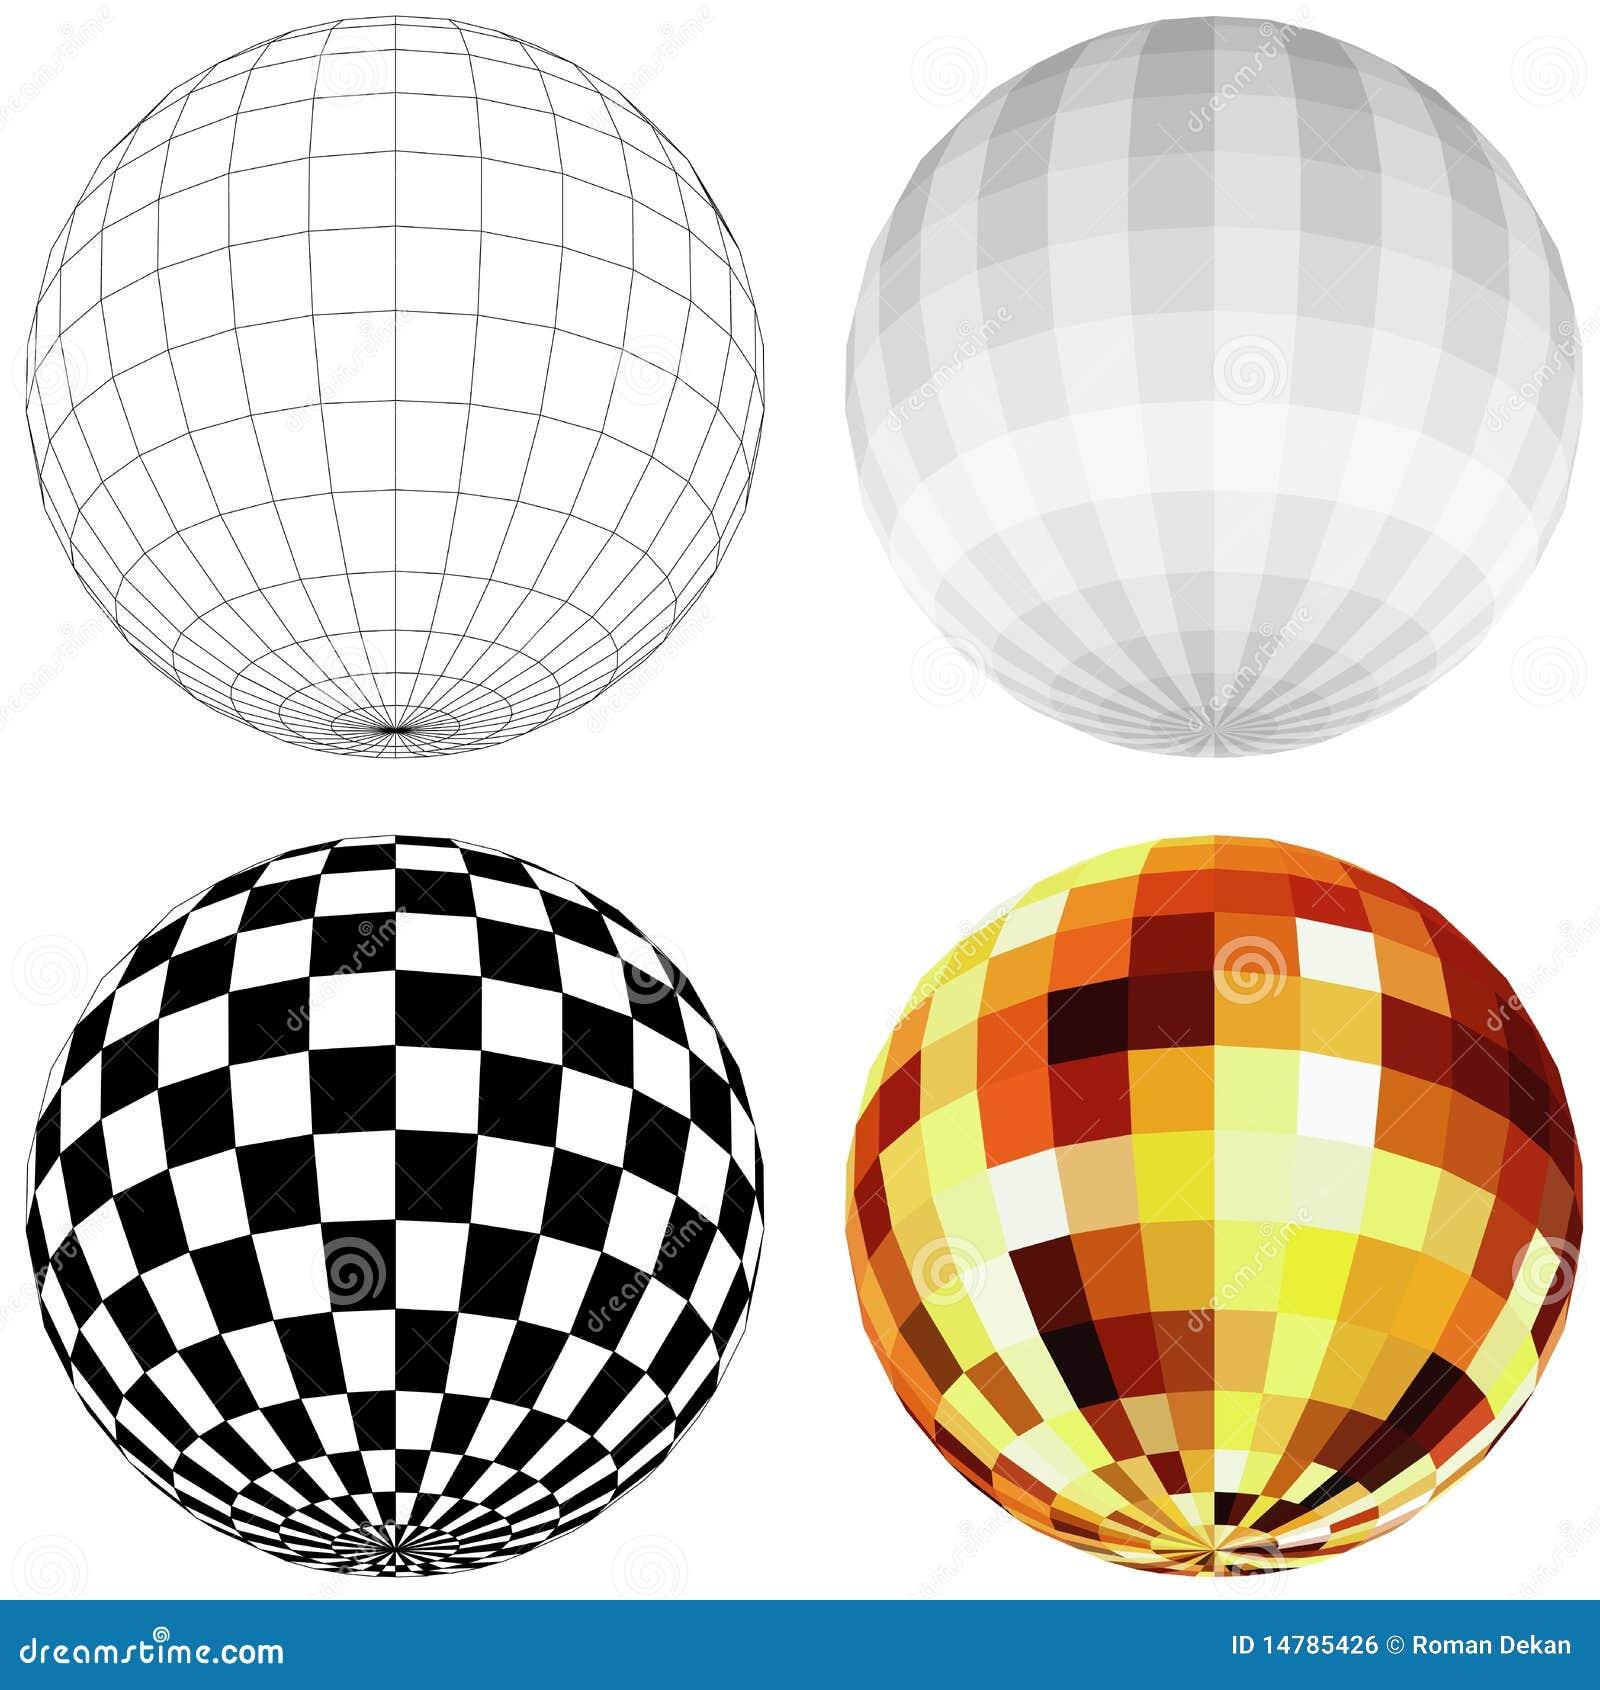 disco ball royalty free stock image image 14785426 disco ball effect vector disco ball vector free download